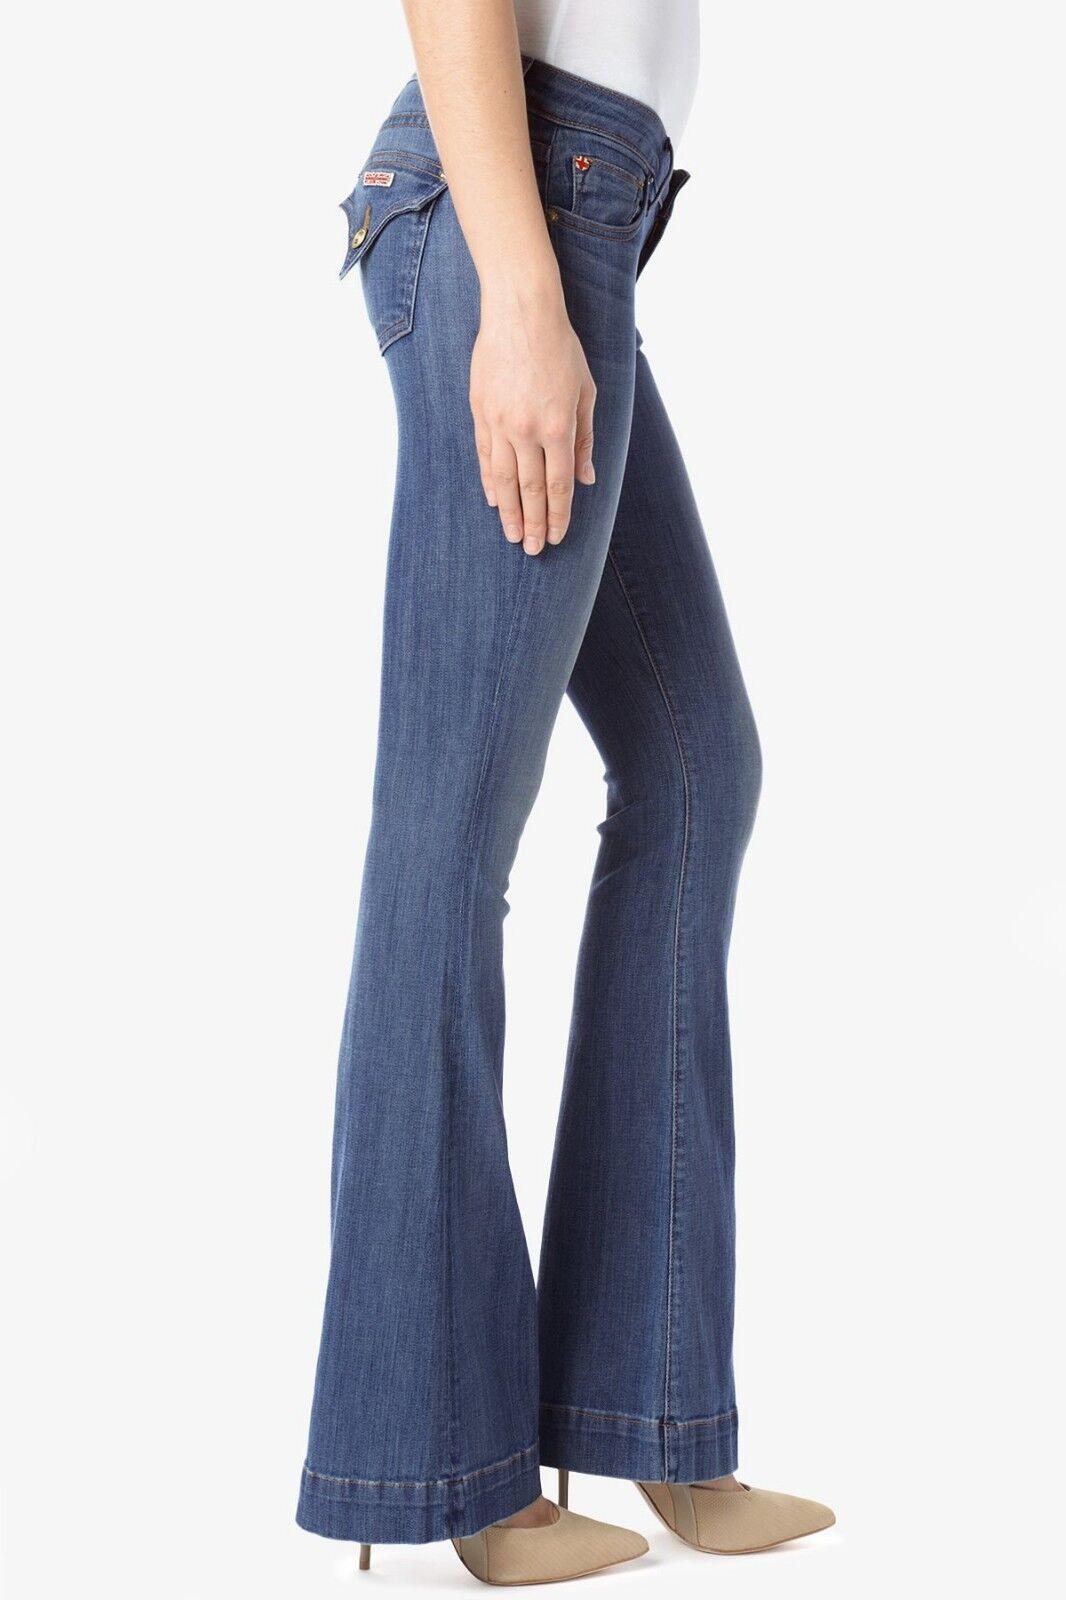 NWT HUDSON FERRIS Flare Jeans w  Trouser Hem 27 BRAND NEW W508DMS TRIBUTE